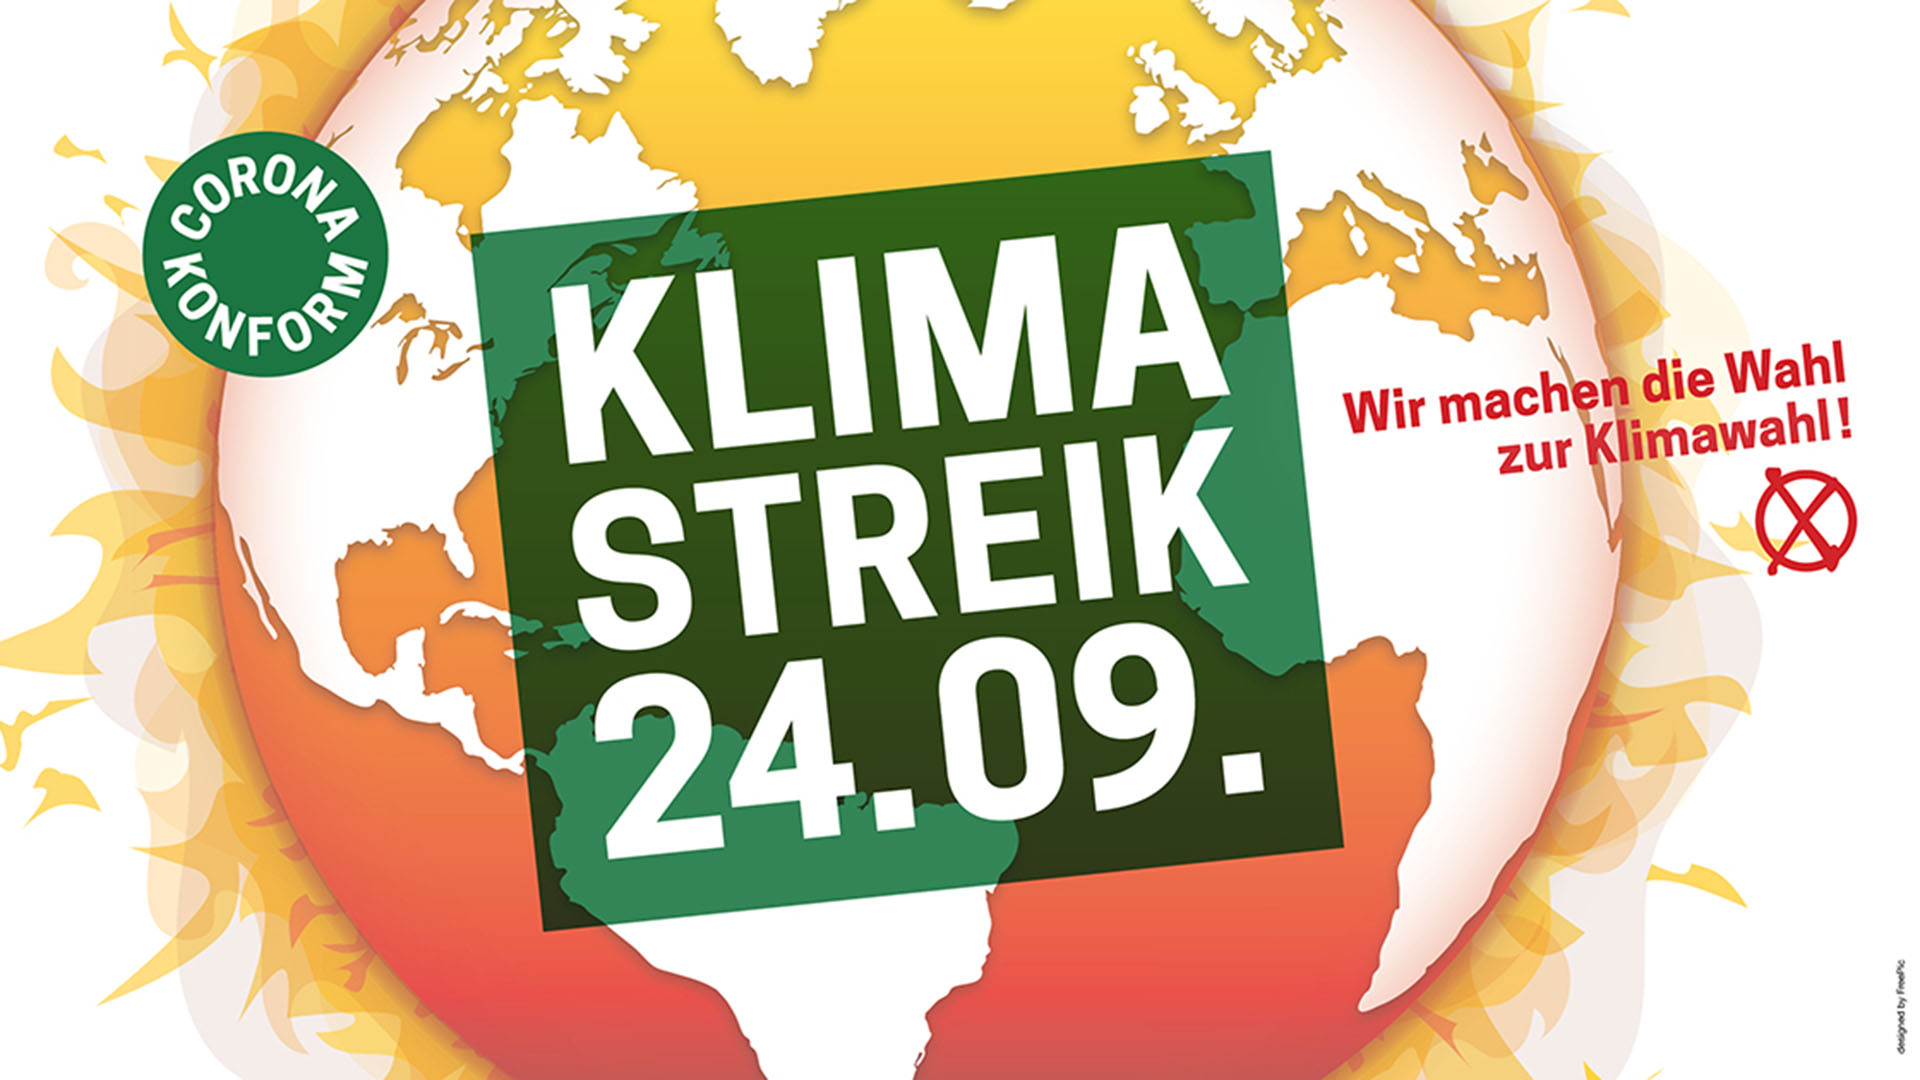 Klimastreik 24.9.2021 Aufruf